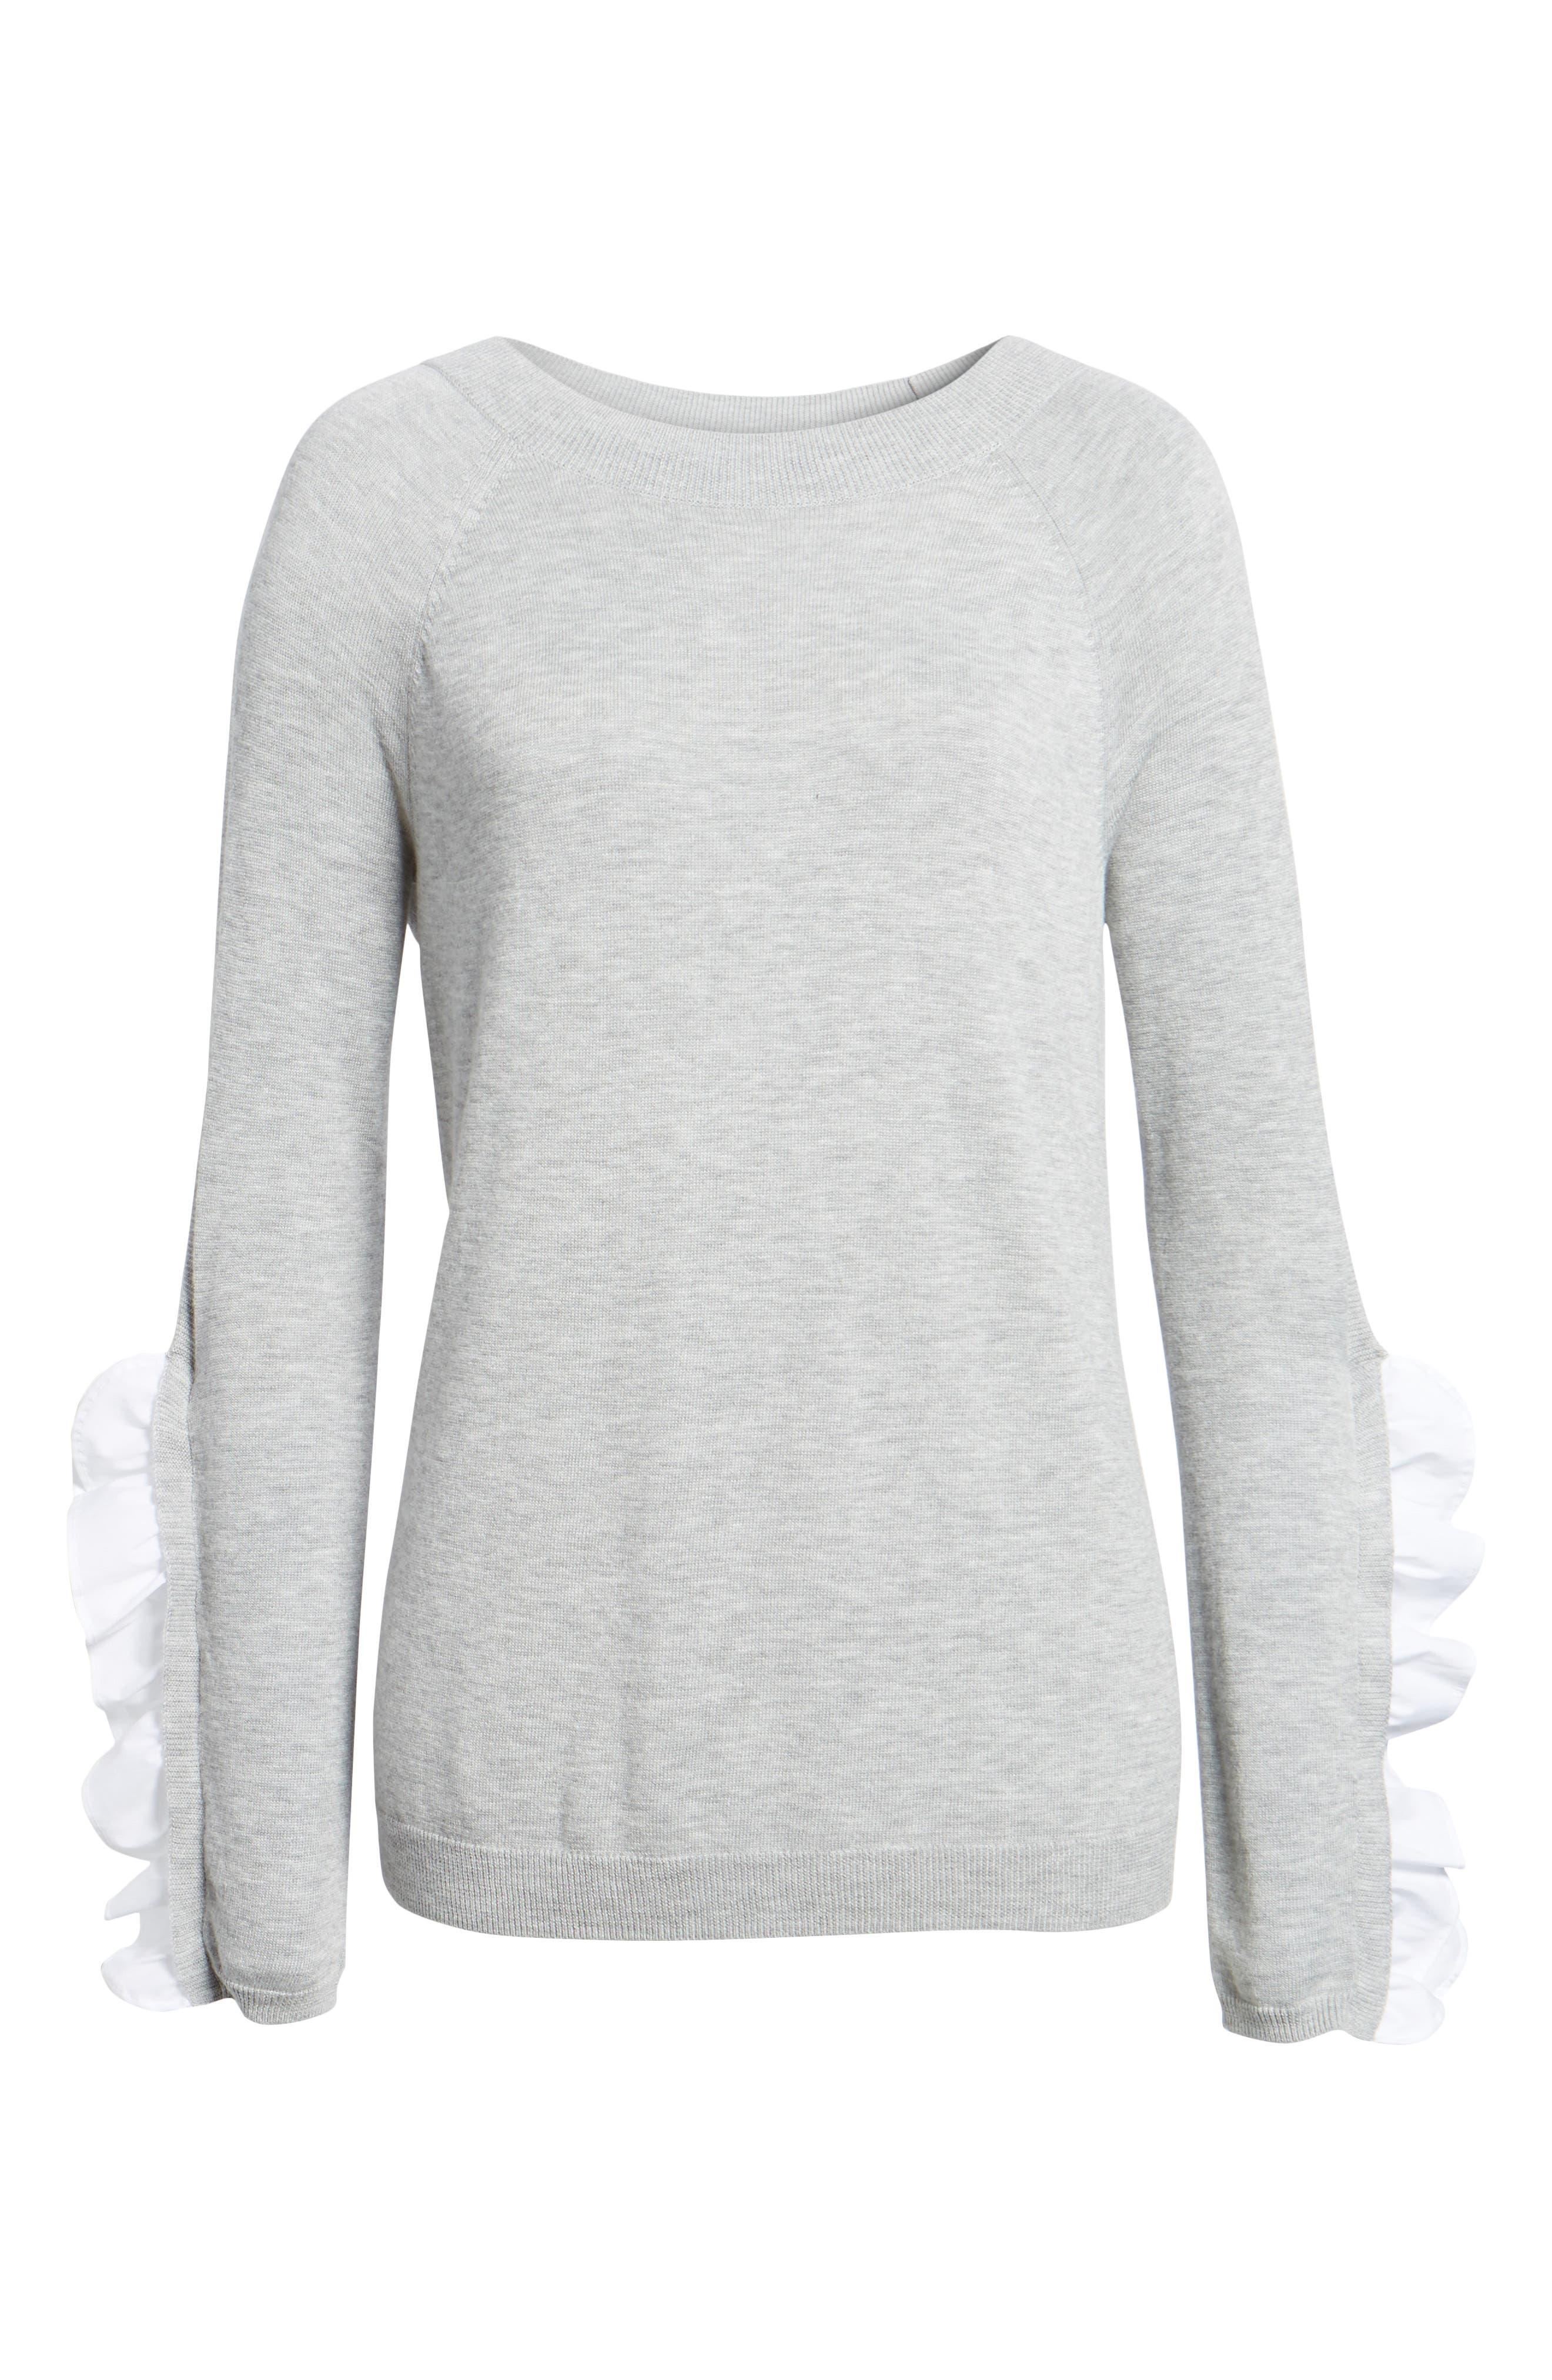 Ruffle Sleeve Sweater,                             Alternate thumbnail 6, color,                             Grey Heather